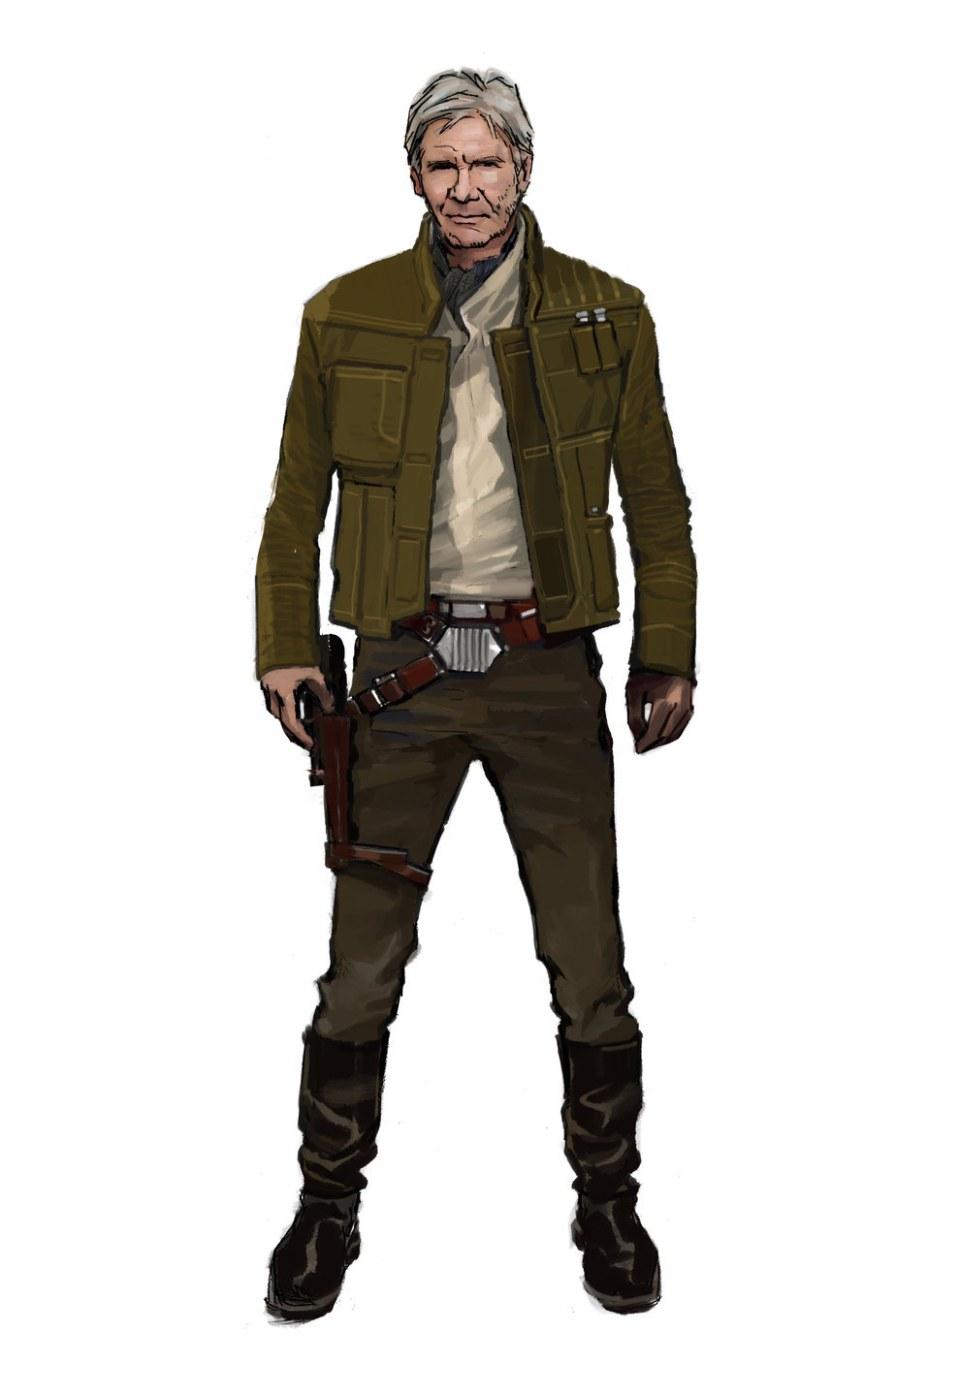 Star wars concept art (5)